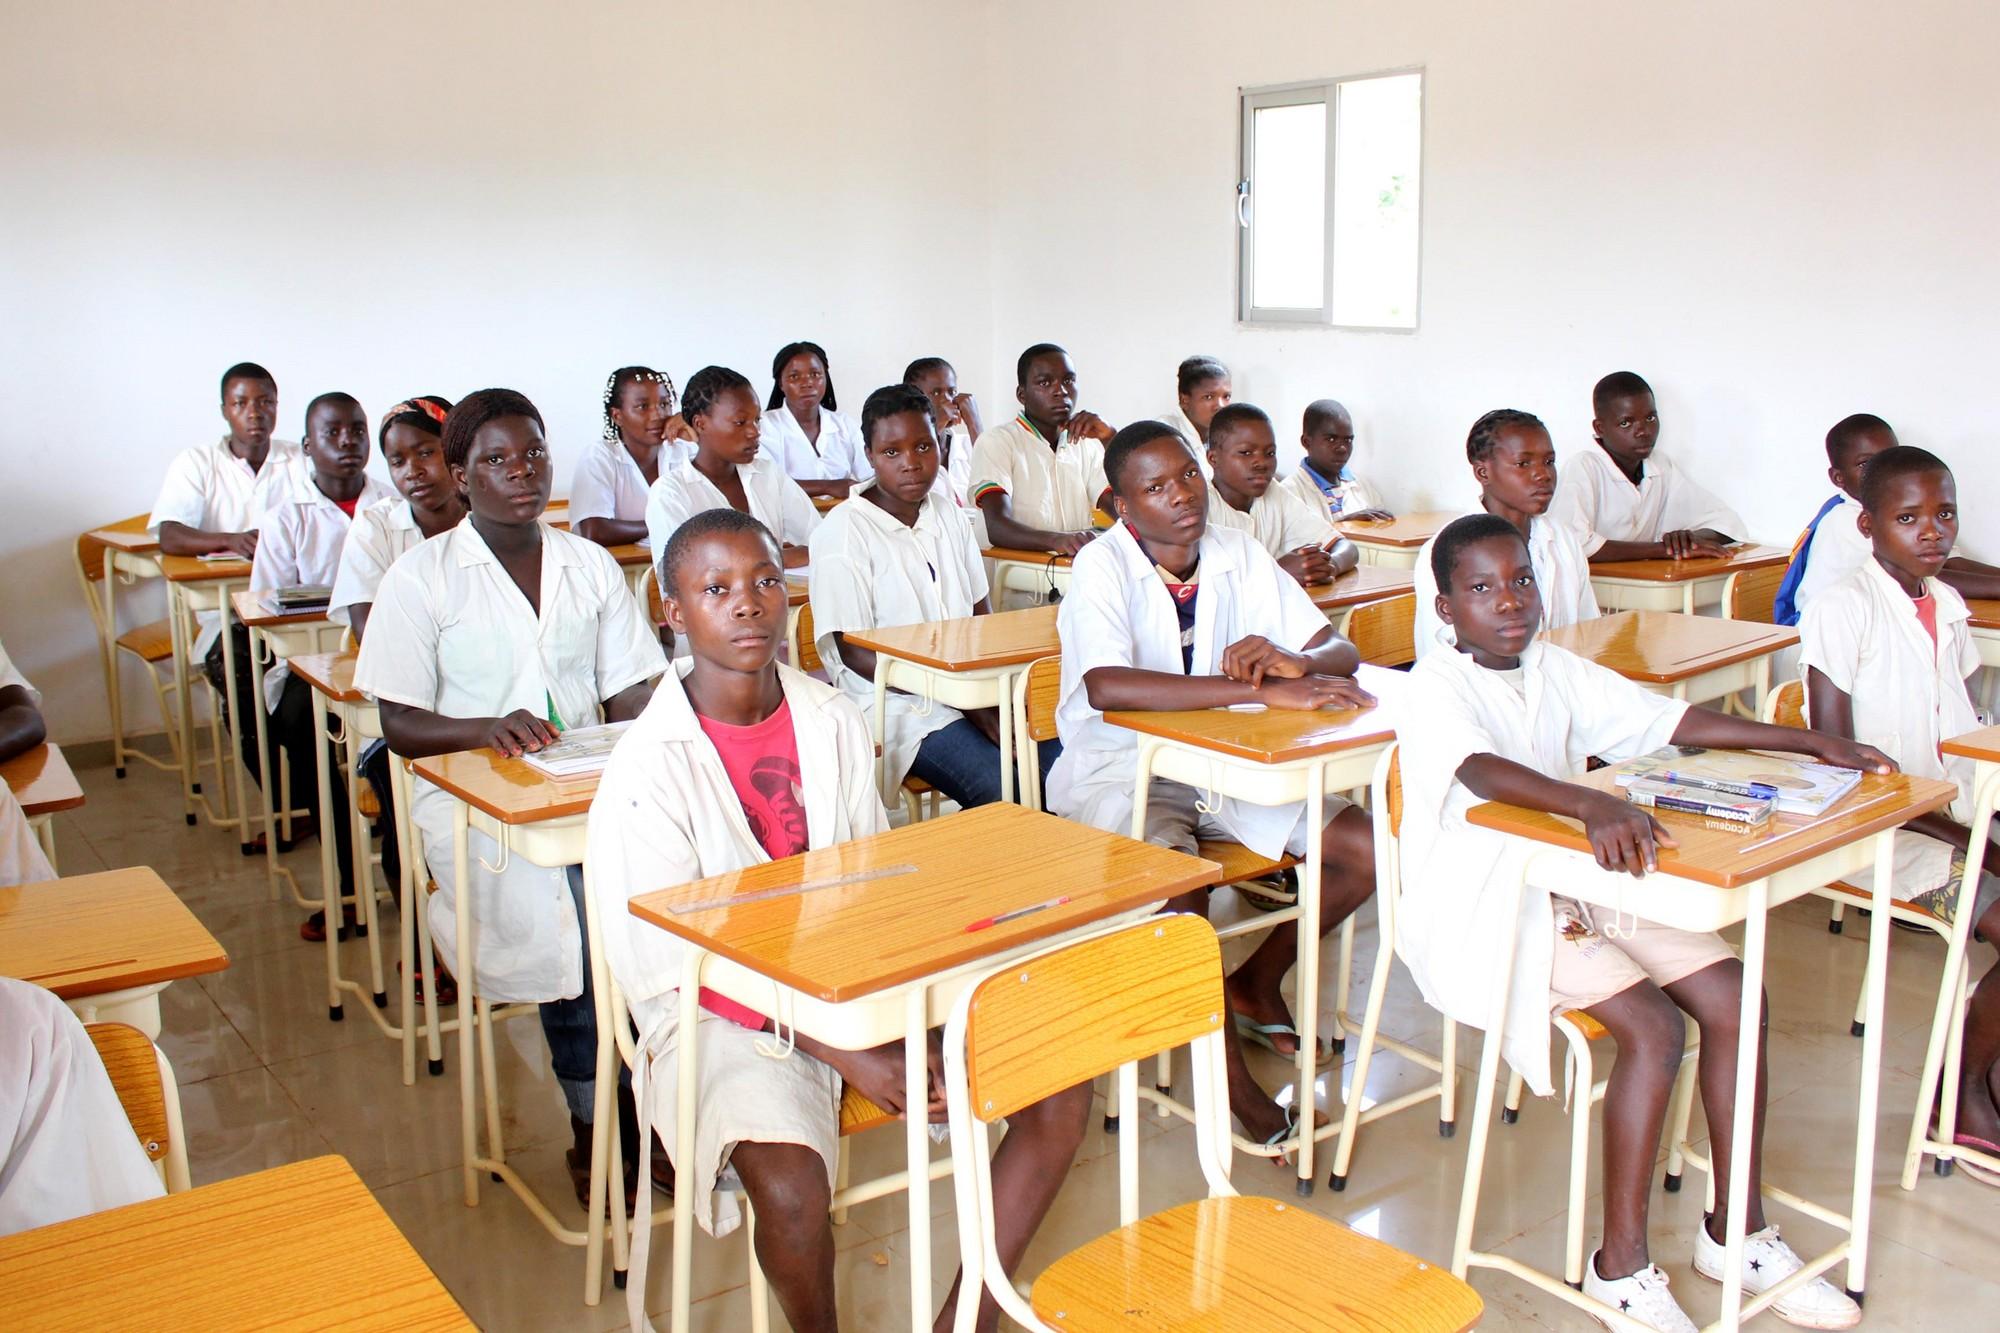 Alunos do Maquela do Zombo frequentam aulas na RDC por falta de salas